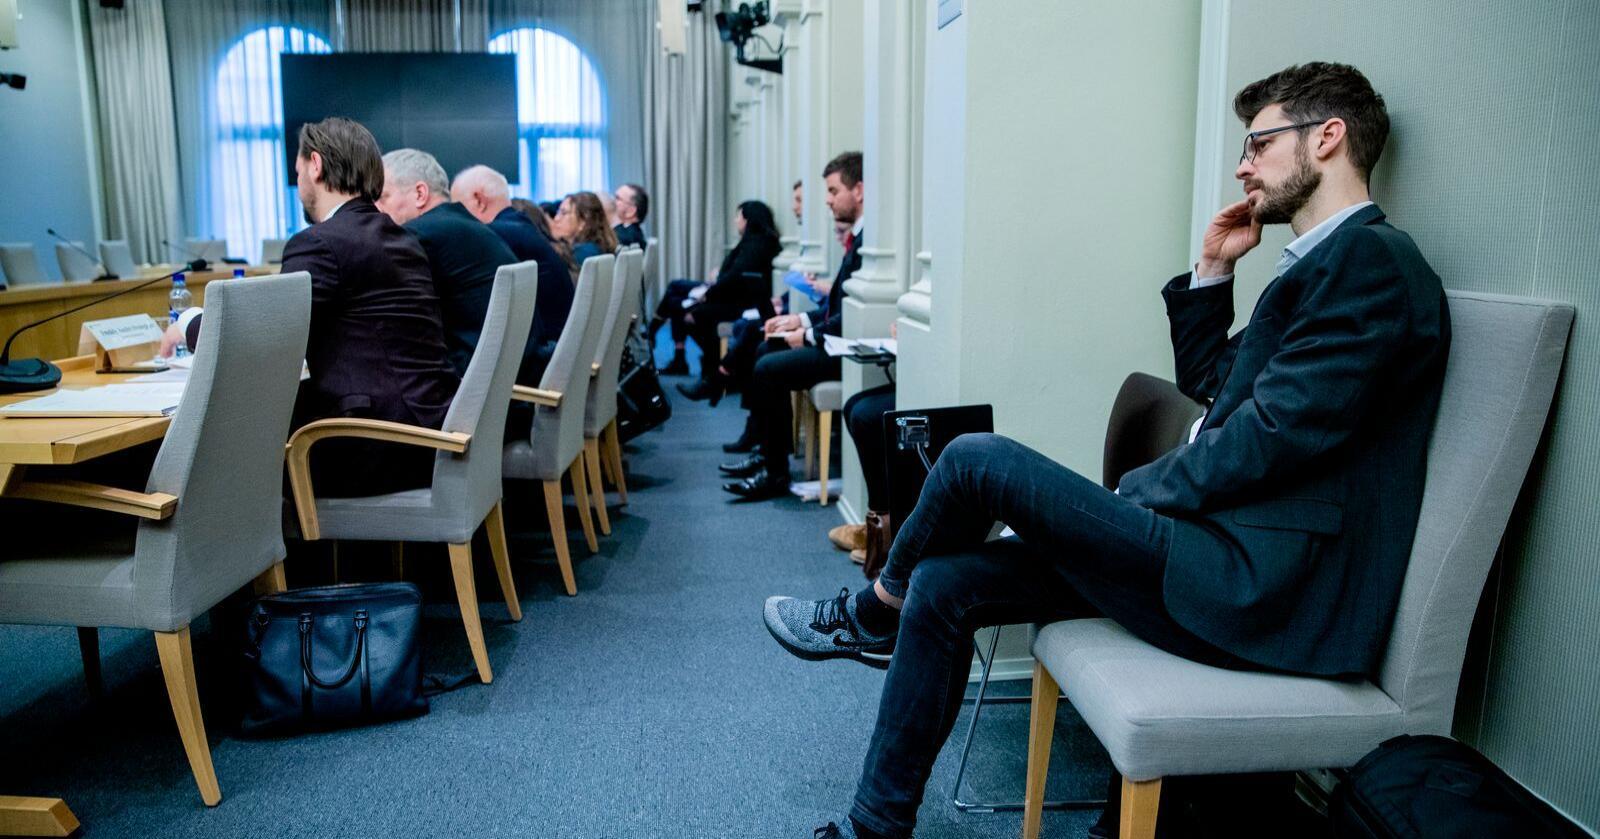 Rødt-leder Bjørnar Moxnes vil avlive NorthConnect-saken en gang for alle. Foto: Stian Lysberg Solum / NTB scanpix